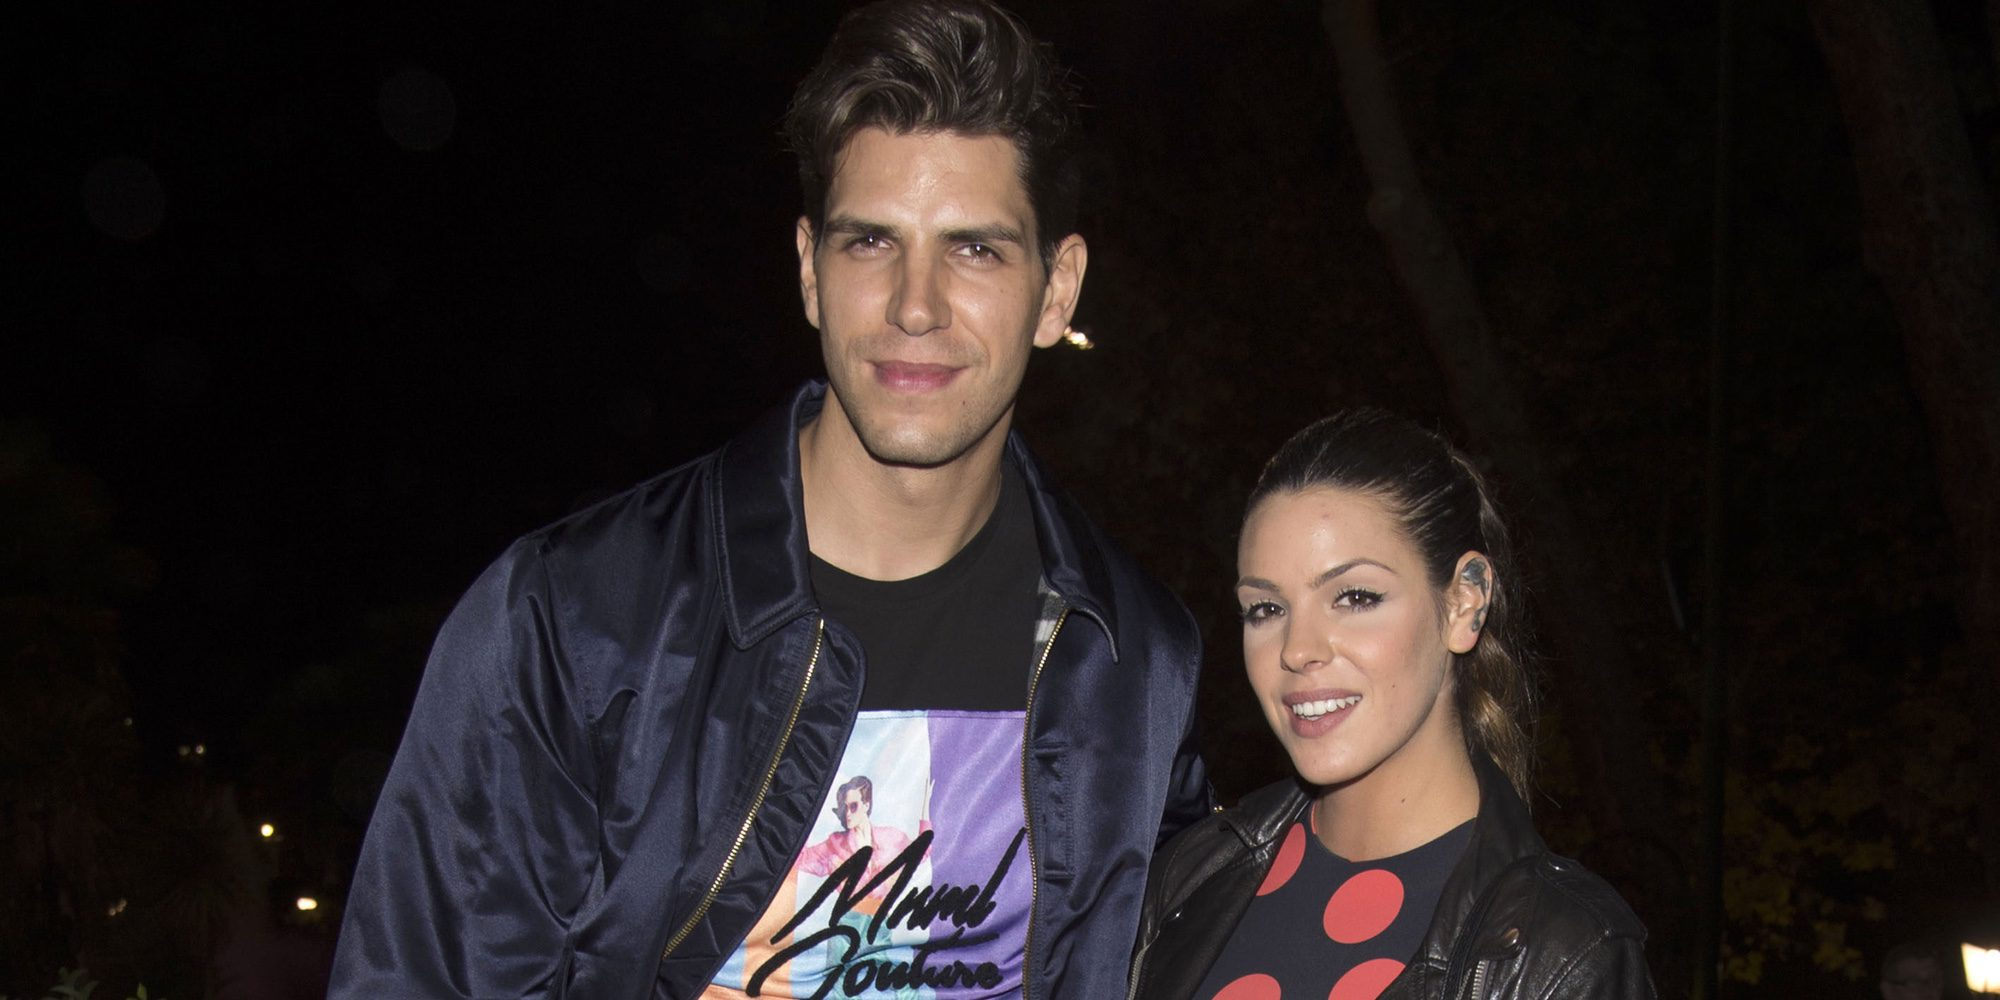 Diego Matamoros sigue sin hablarse con su hermana Laura Matamoros